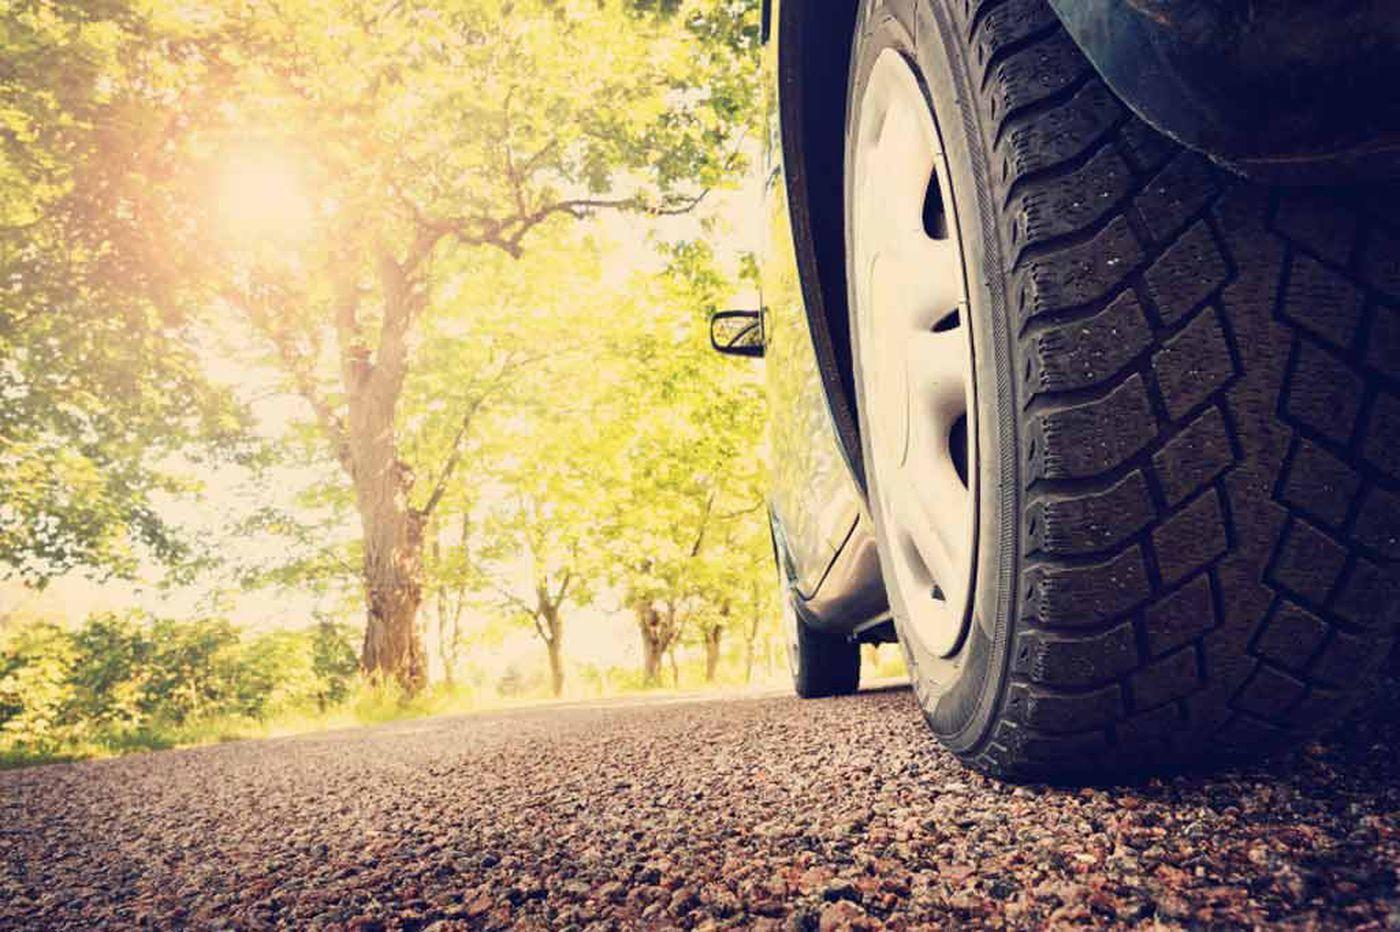 Tire registration could save lives